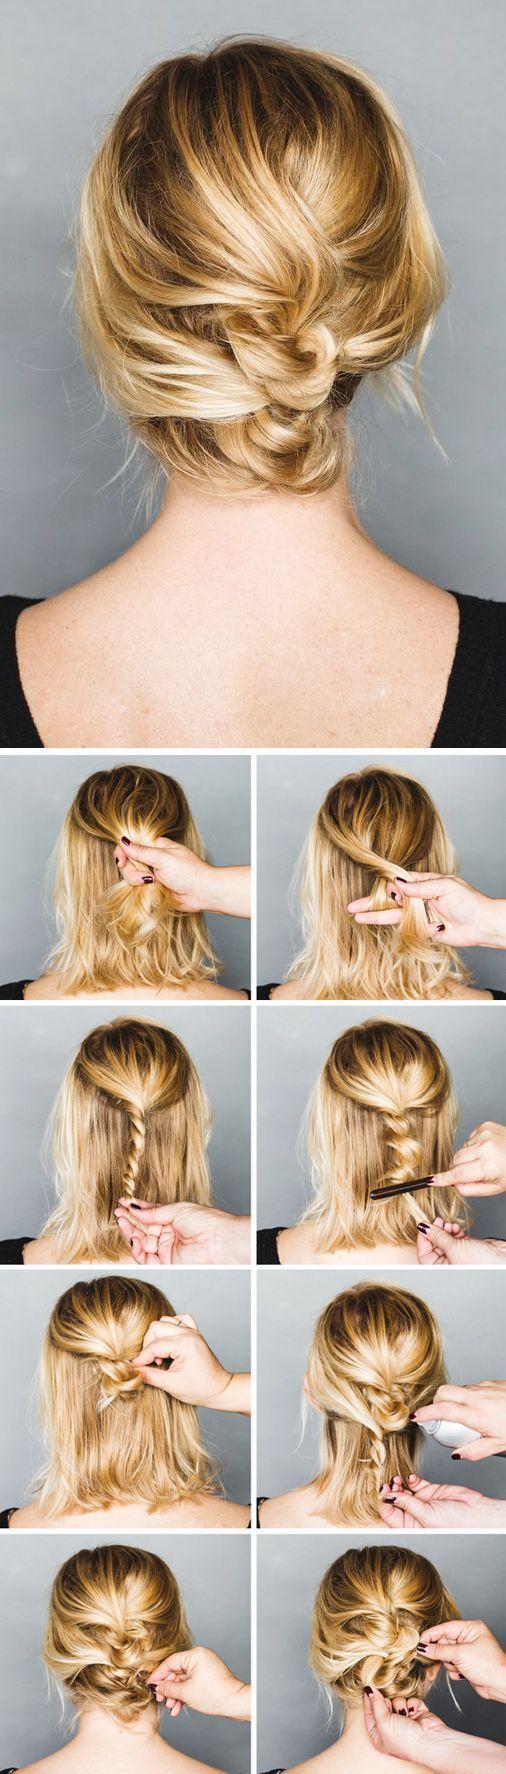 Trenzas para cabello corto | ActitudFEM✅: